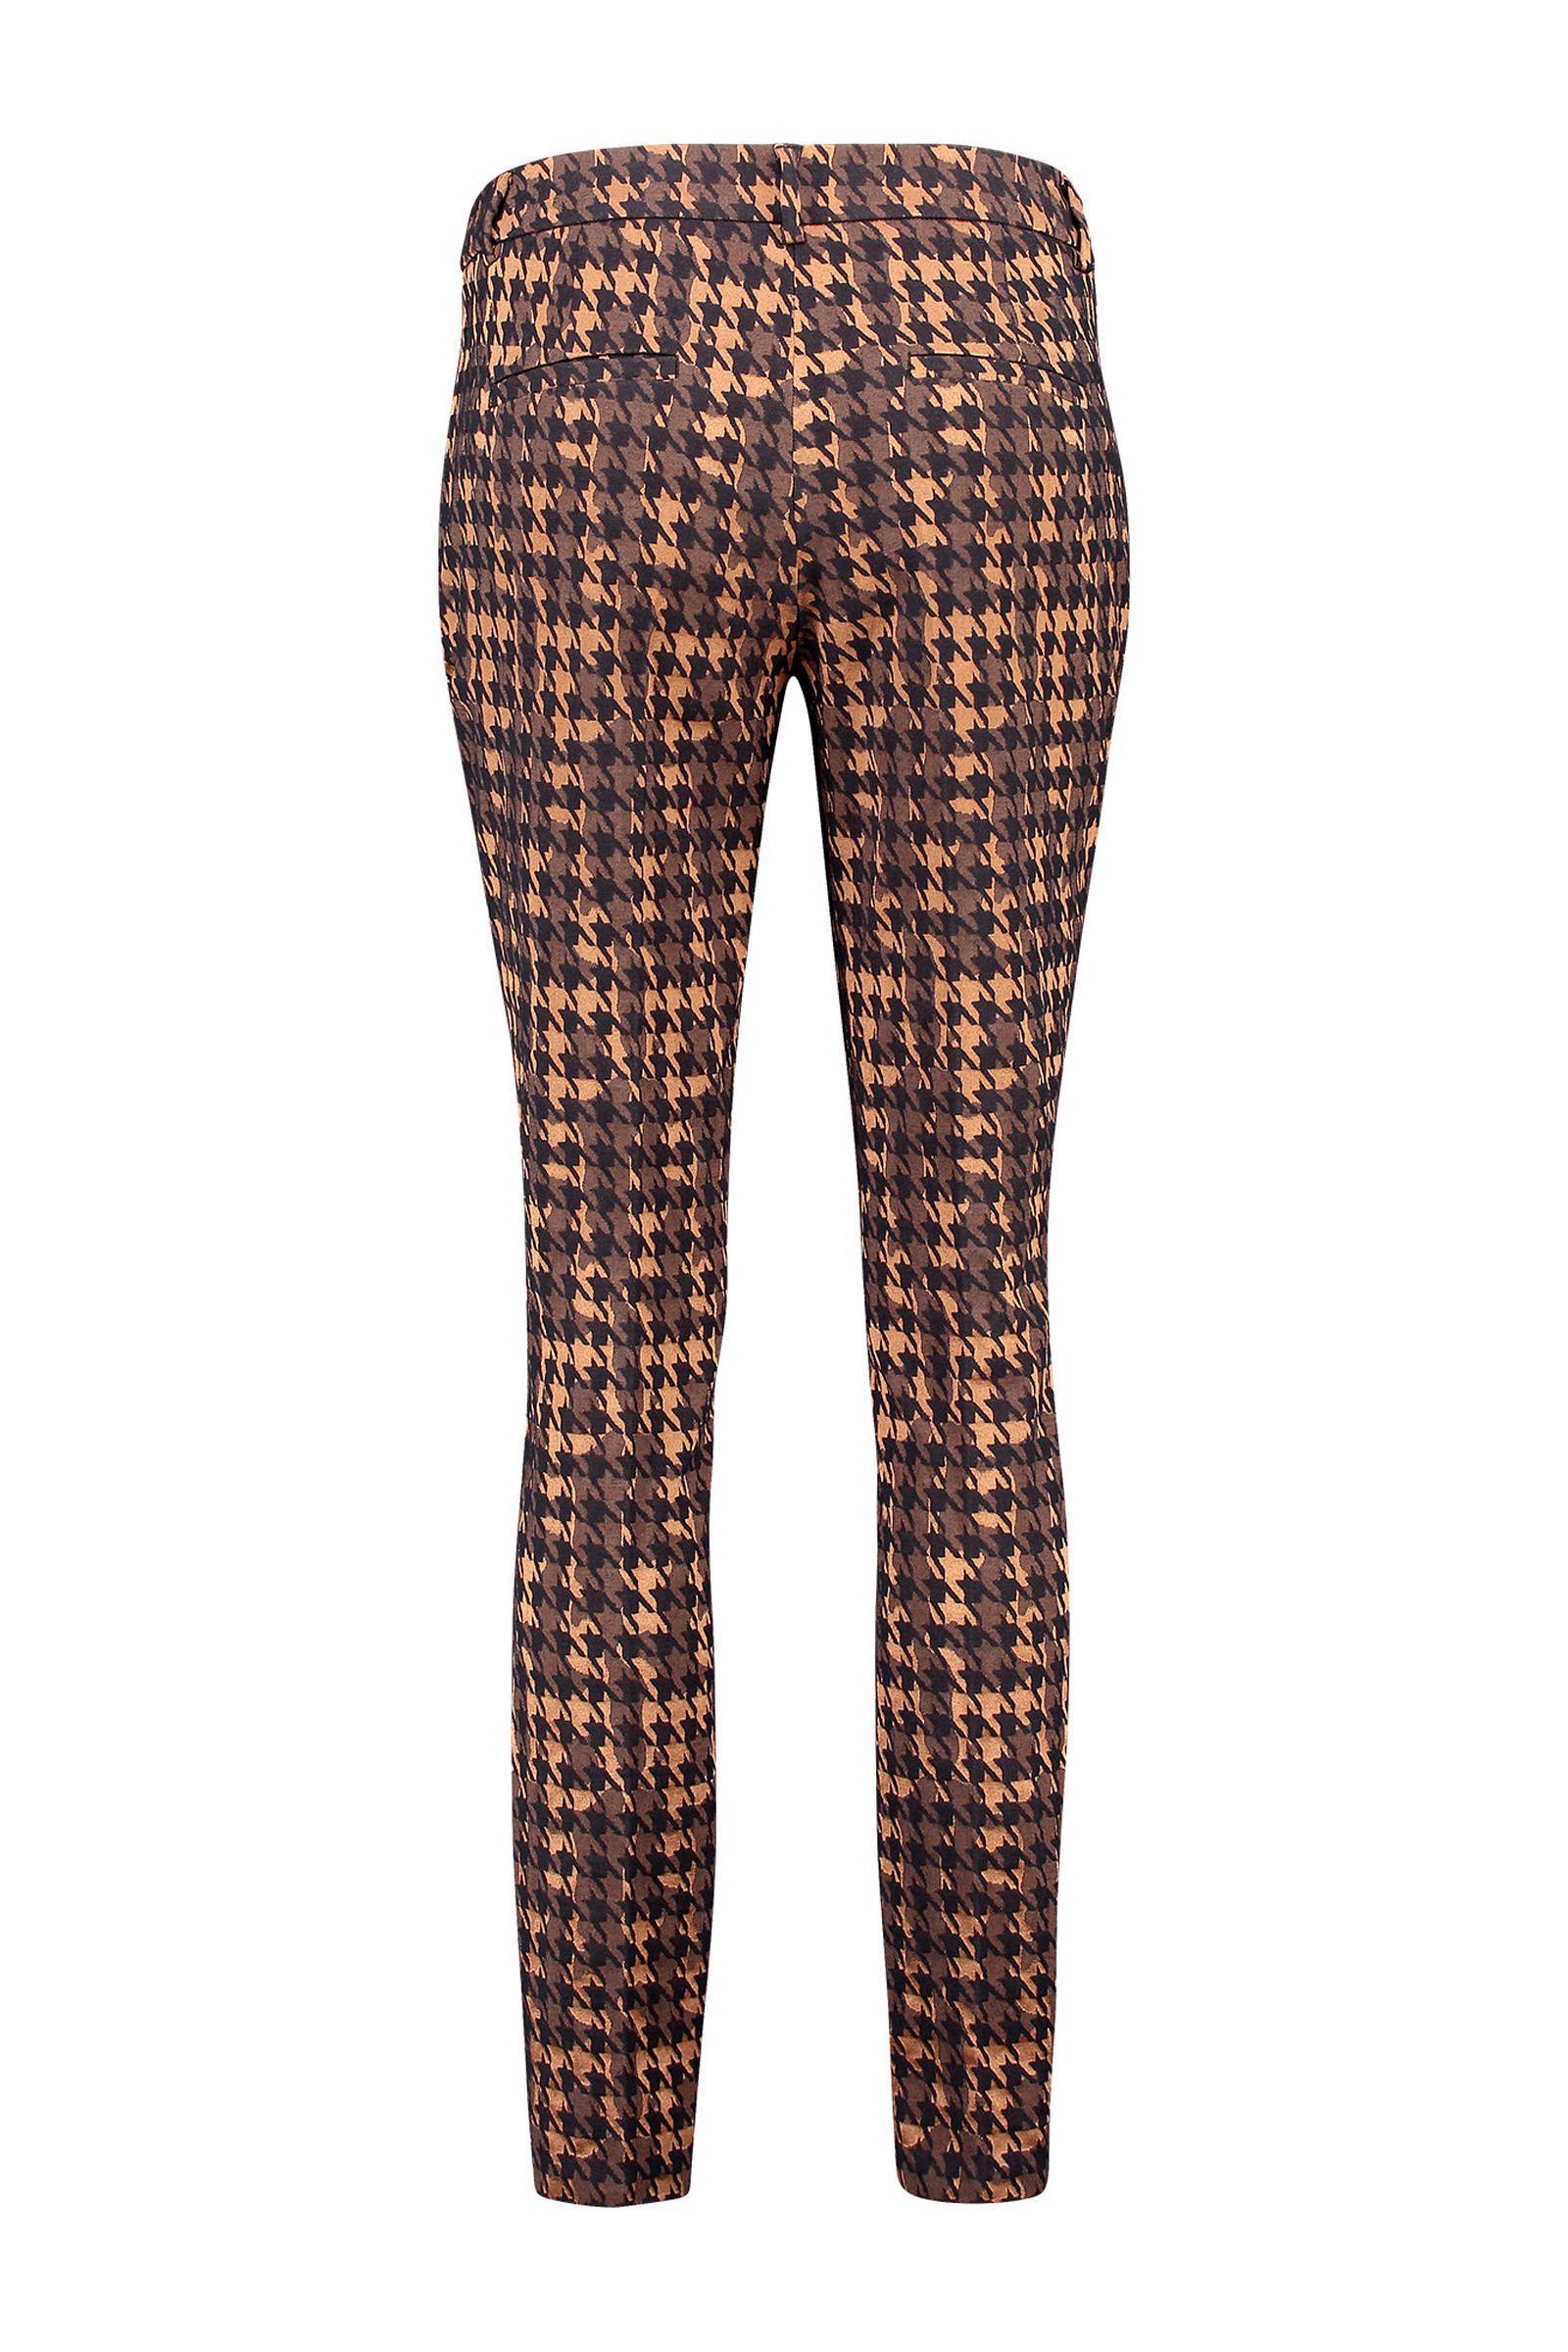 Expresso skinny broek met pied de poule bruin multi   wehkamp